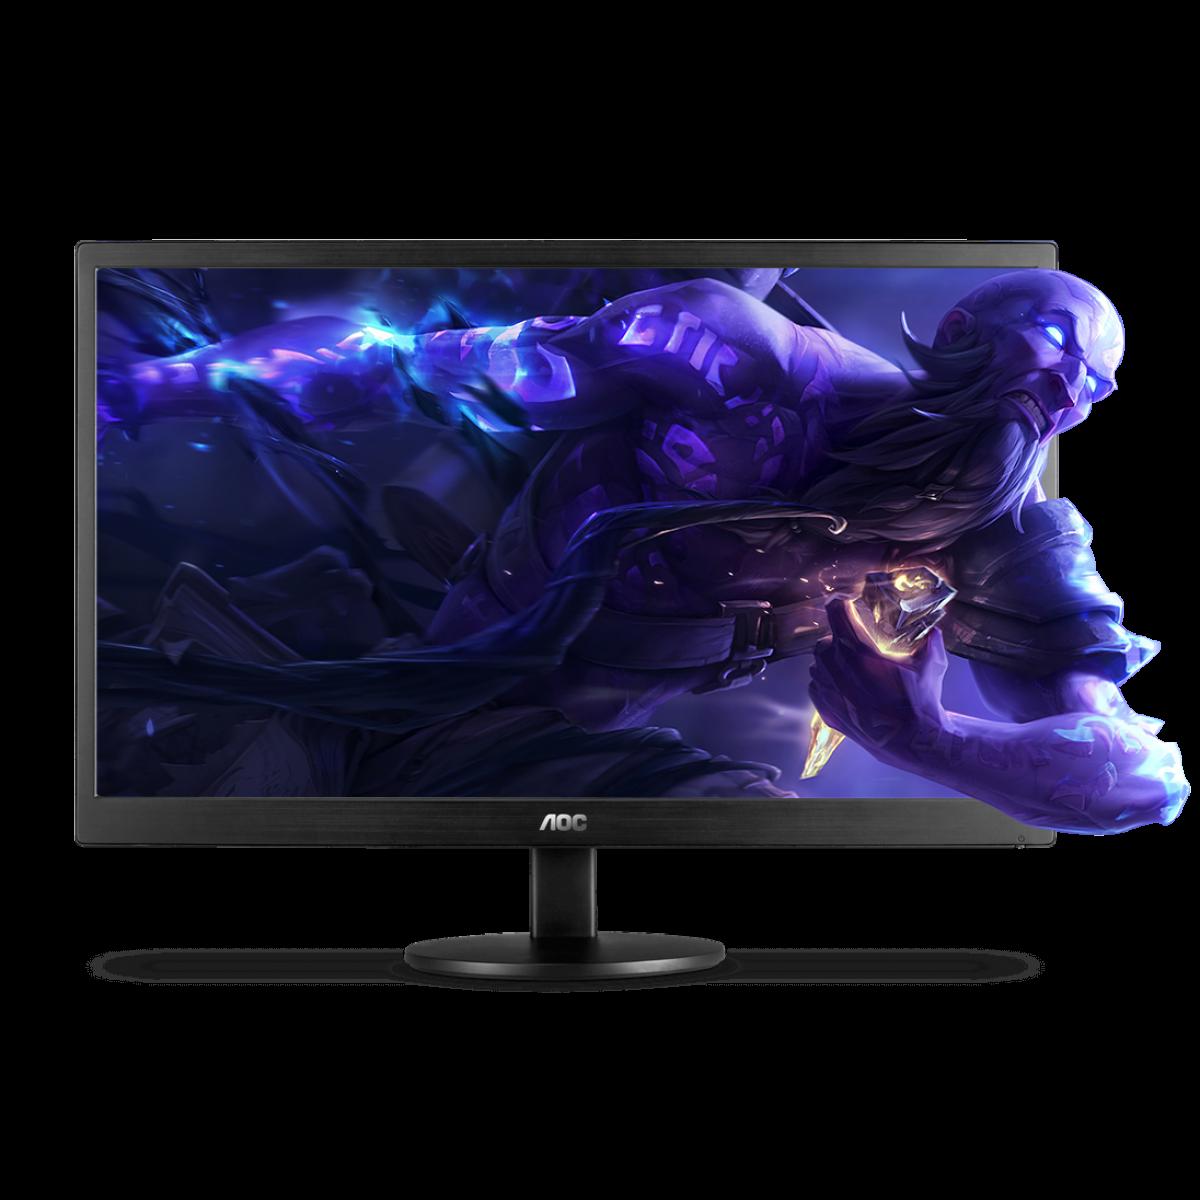 Monitor AOC 23.6 Pol, FULL HD, VGA, HDMI, M2470SWH2